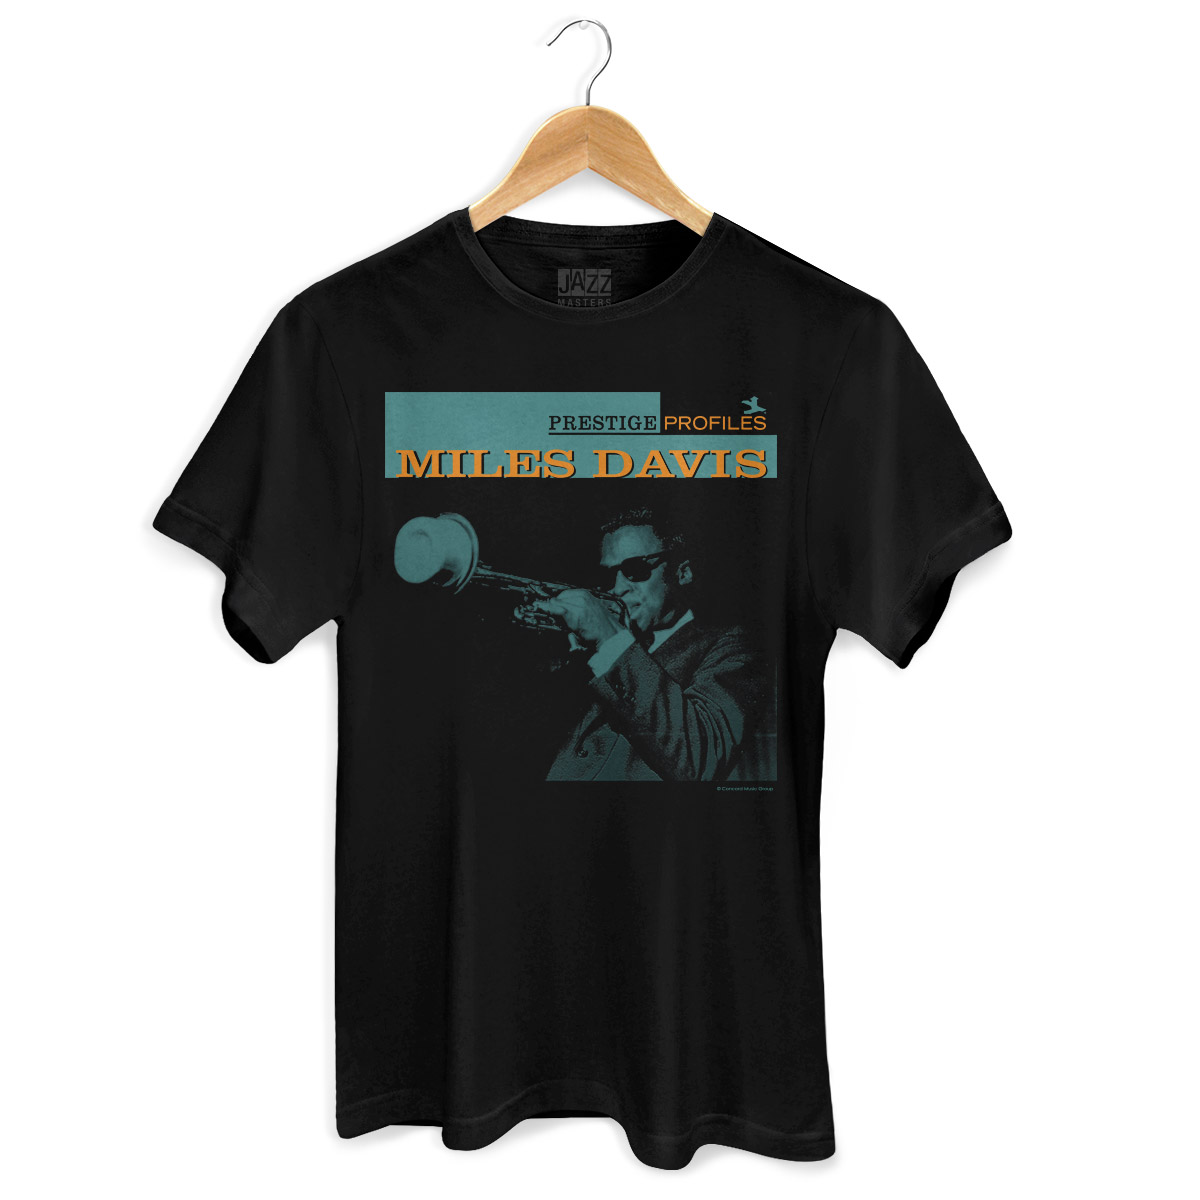 Camiseta Masculina Miles Davis Prestige Profiles